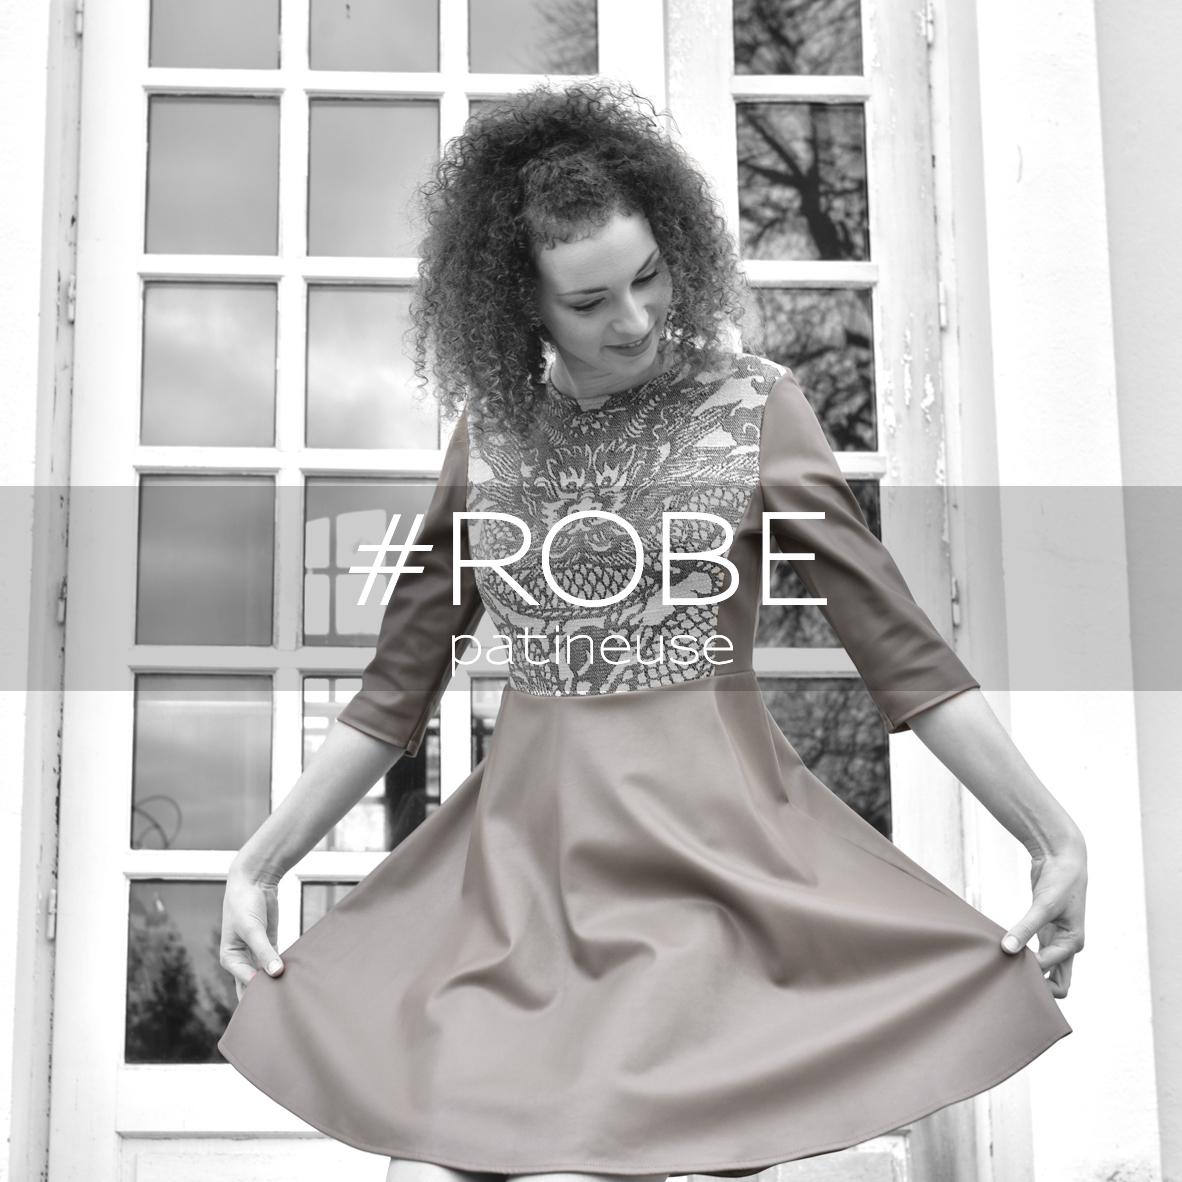 Miss fab - ROBE patineuse - Fabienne Dimanov Paris